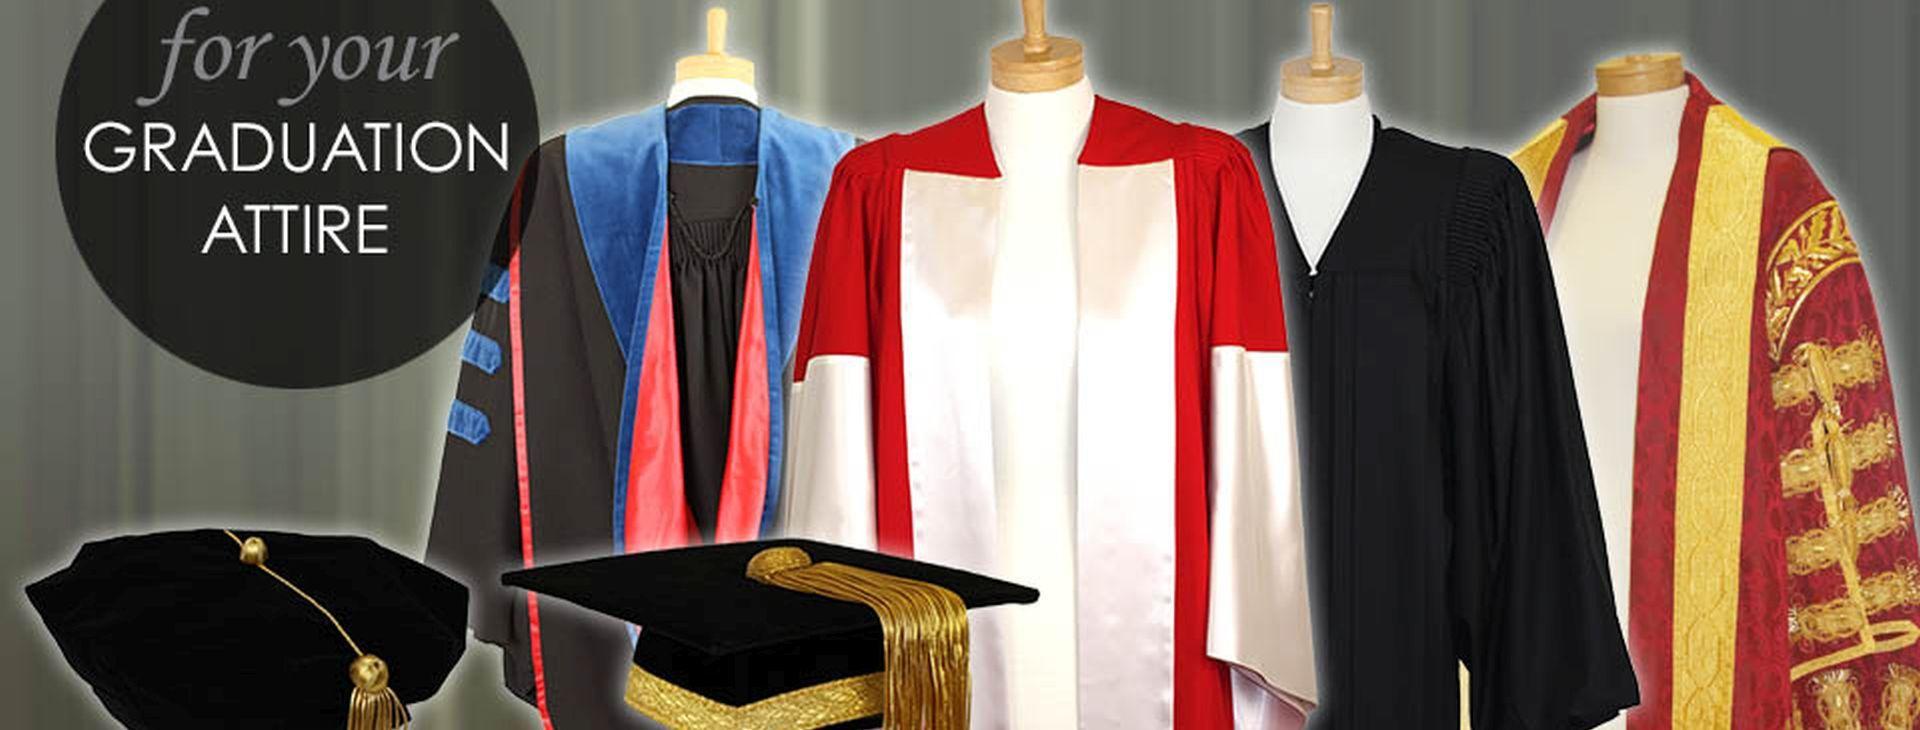 graduation_attire_slide